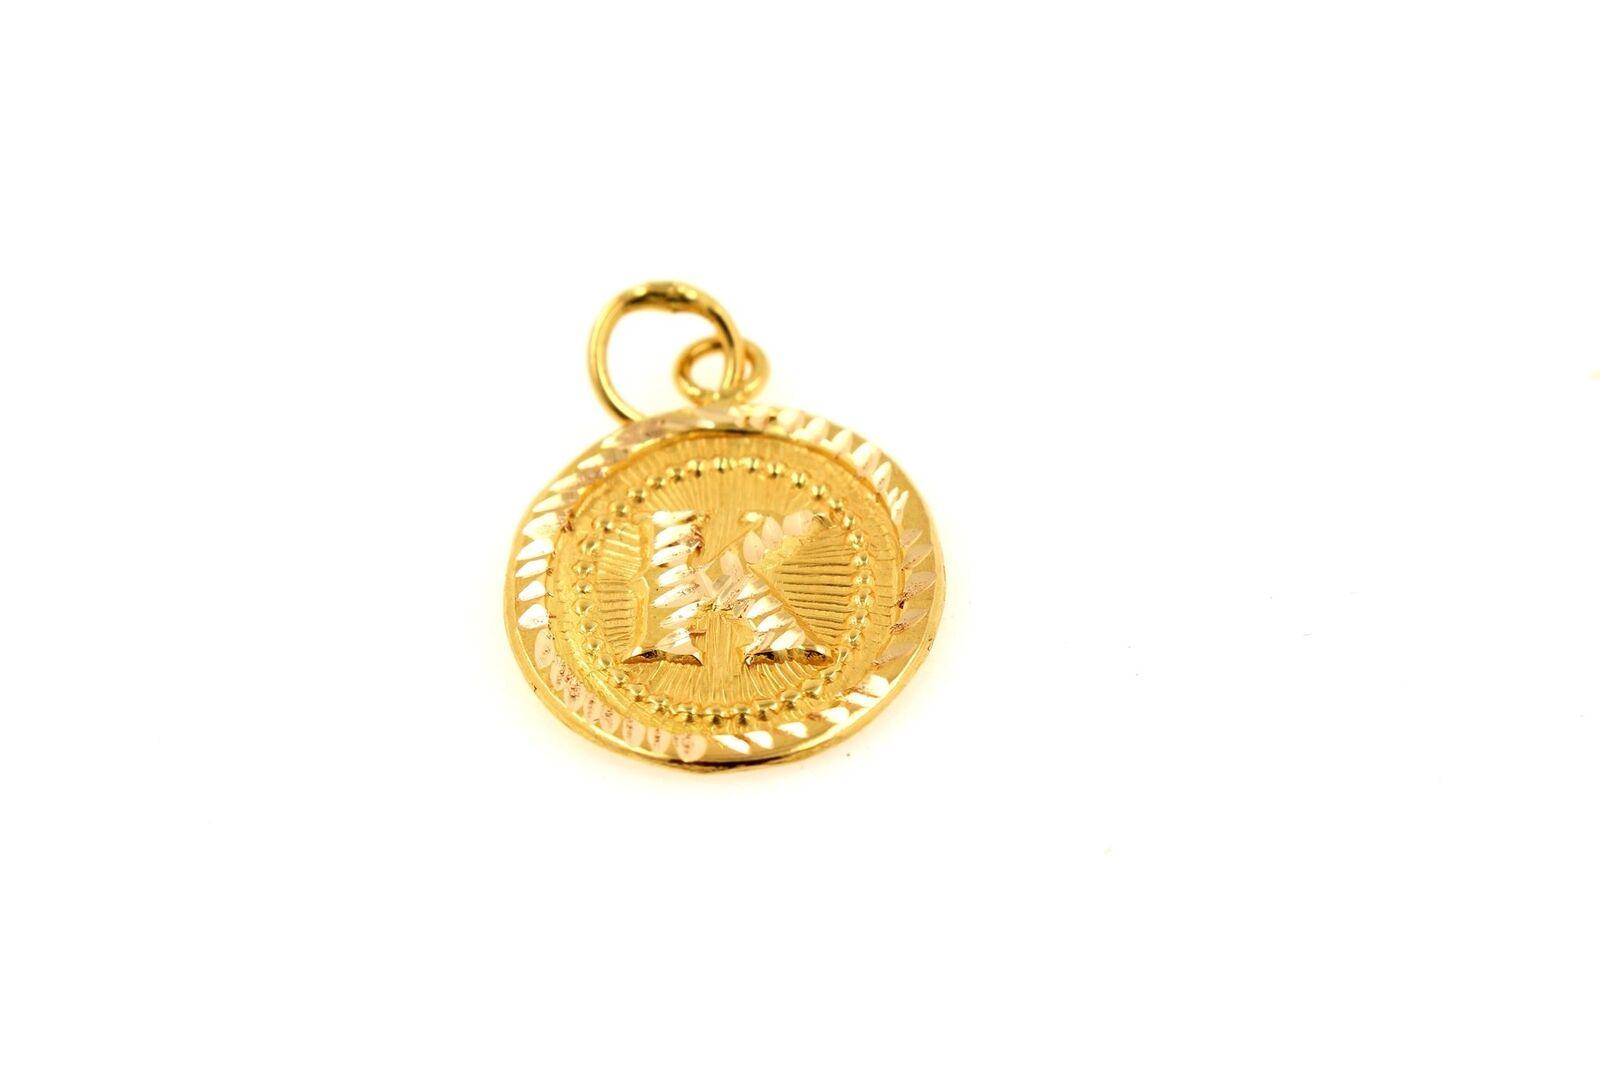 22k 22ct Solid gold Charm Letter K Pendant Oval Design p1477 ns